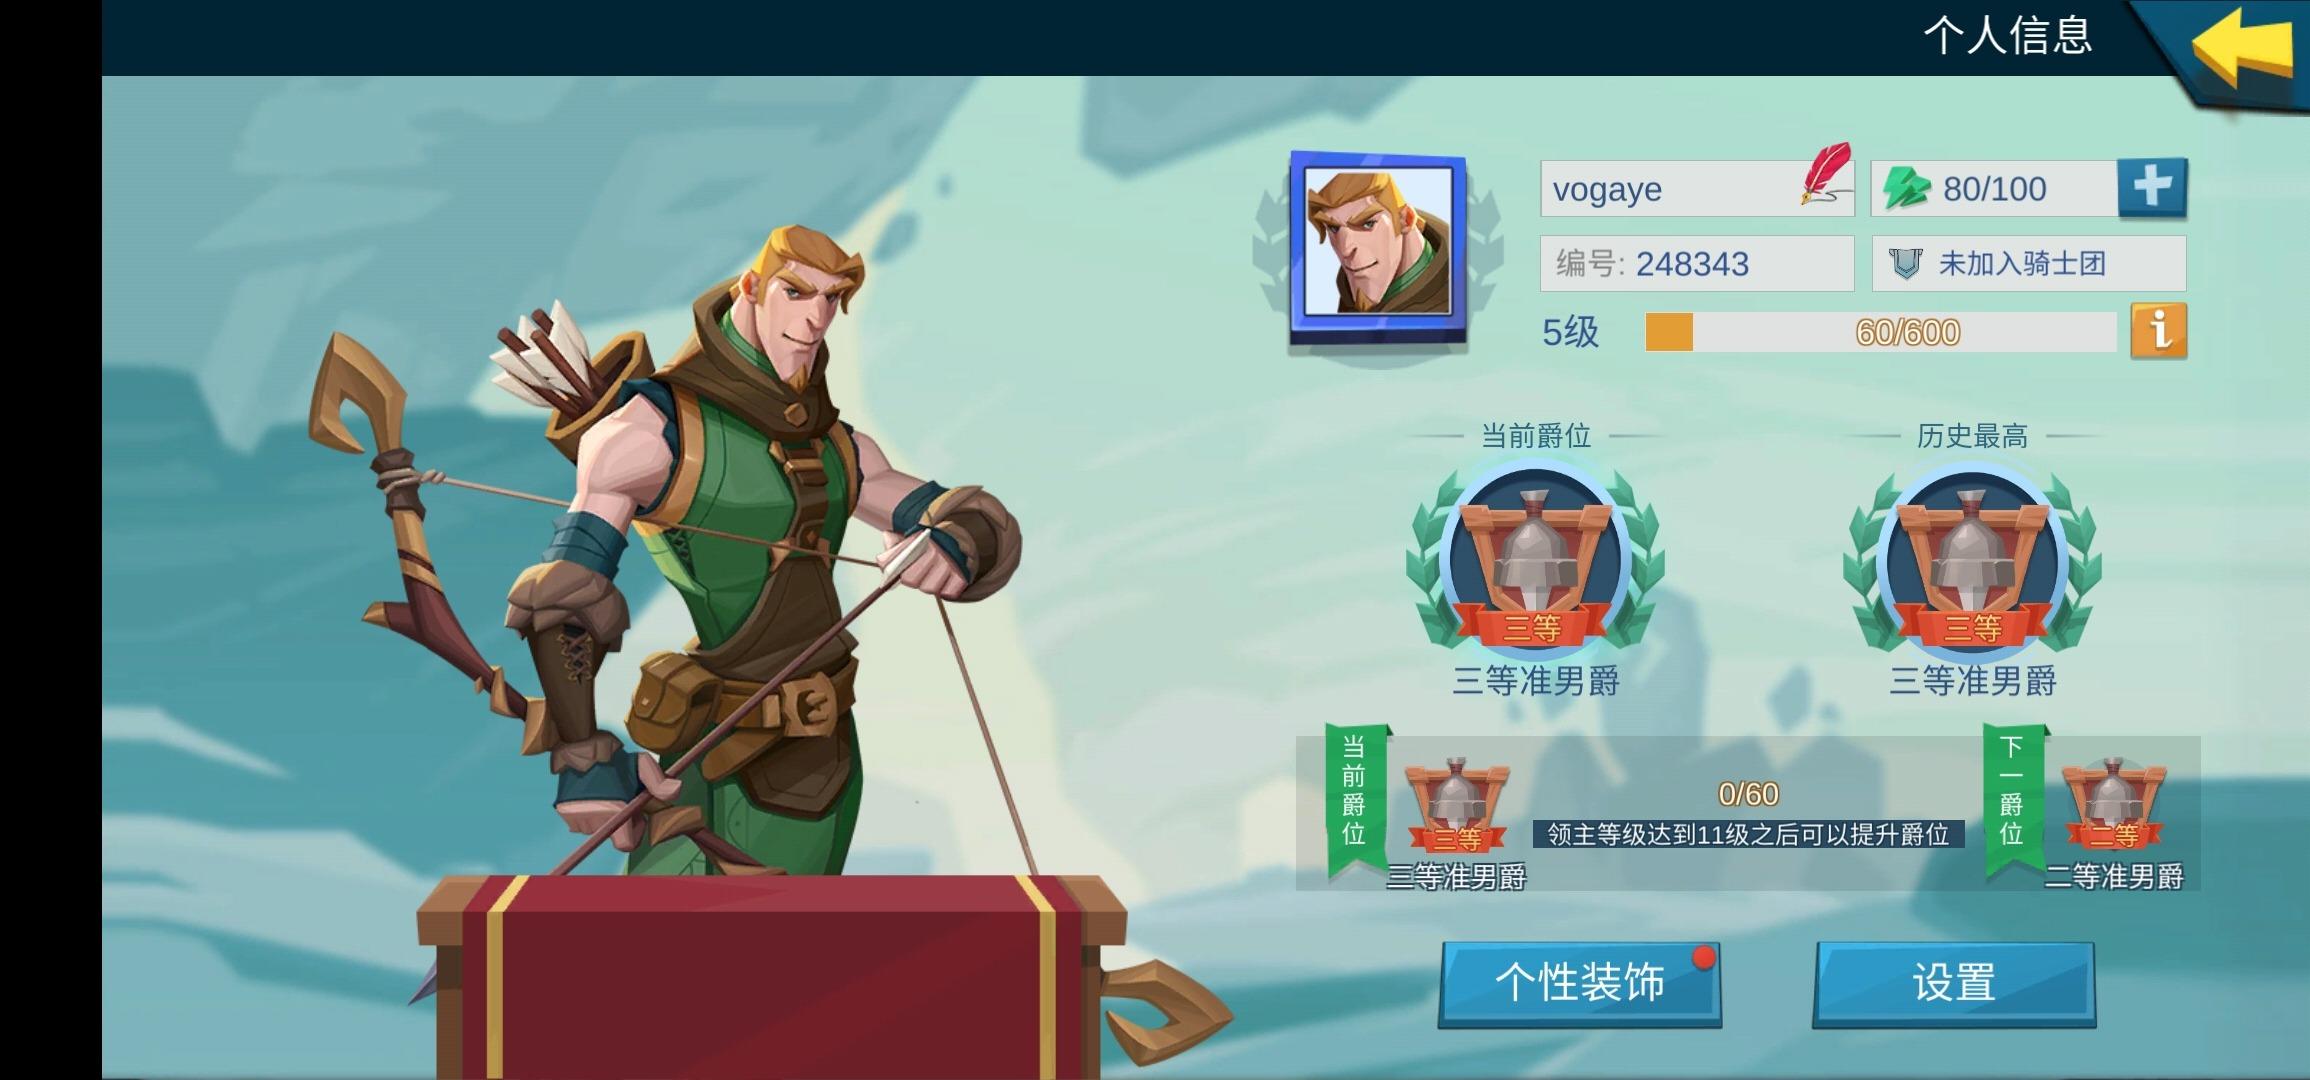 Screenshot_20210601_183701_com.jedigames.p21.guanwang.jpg